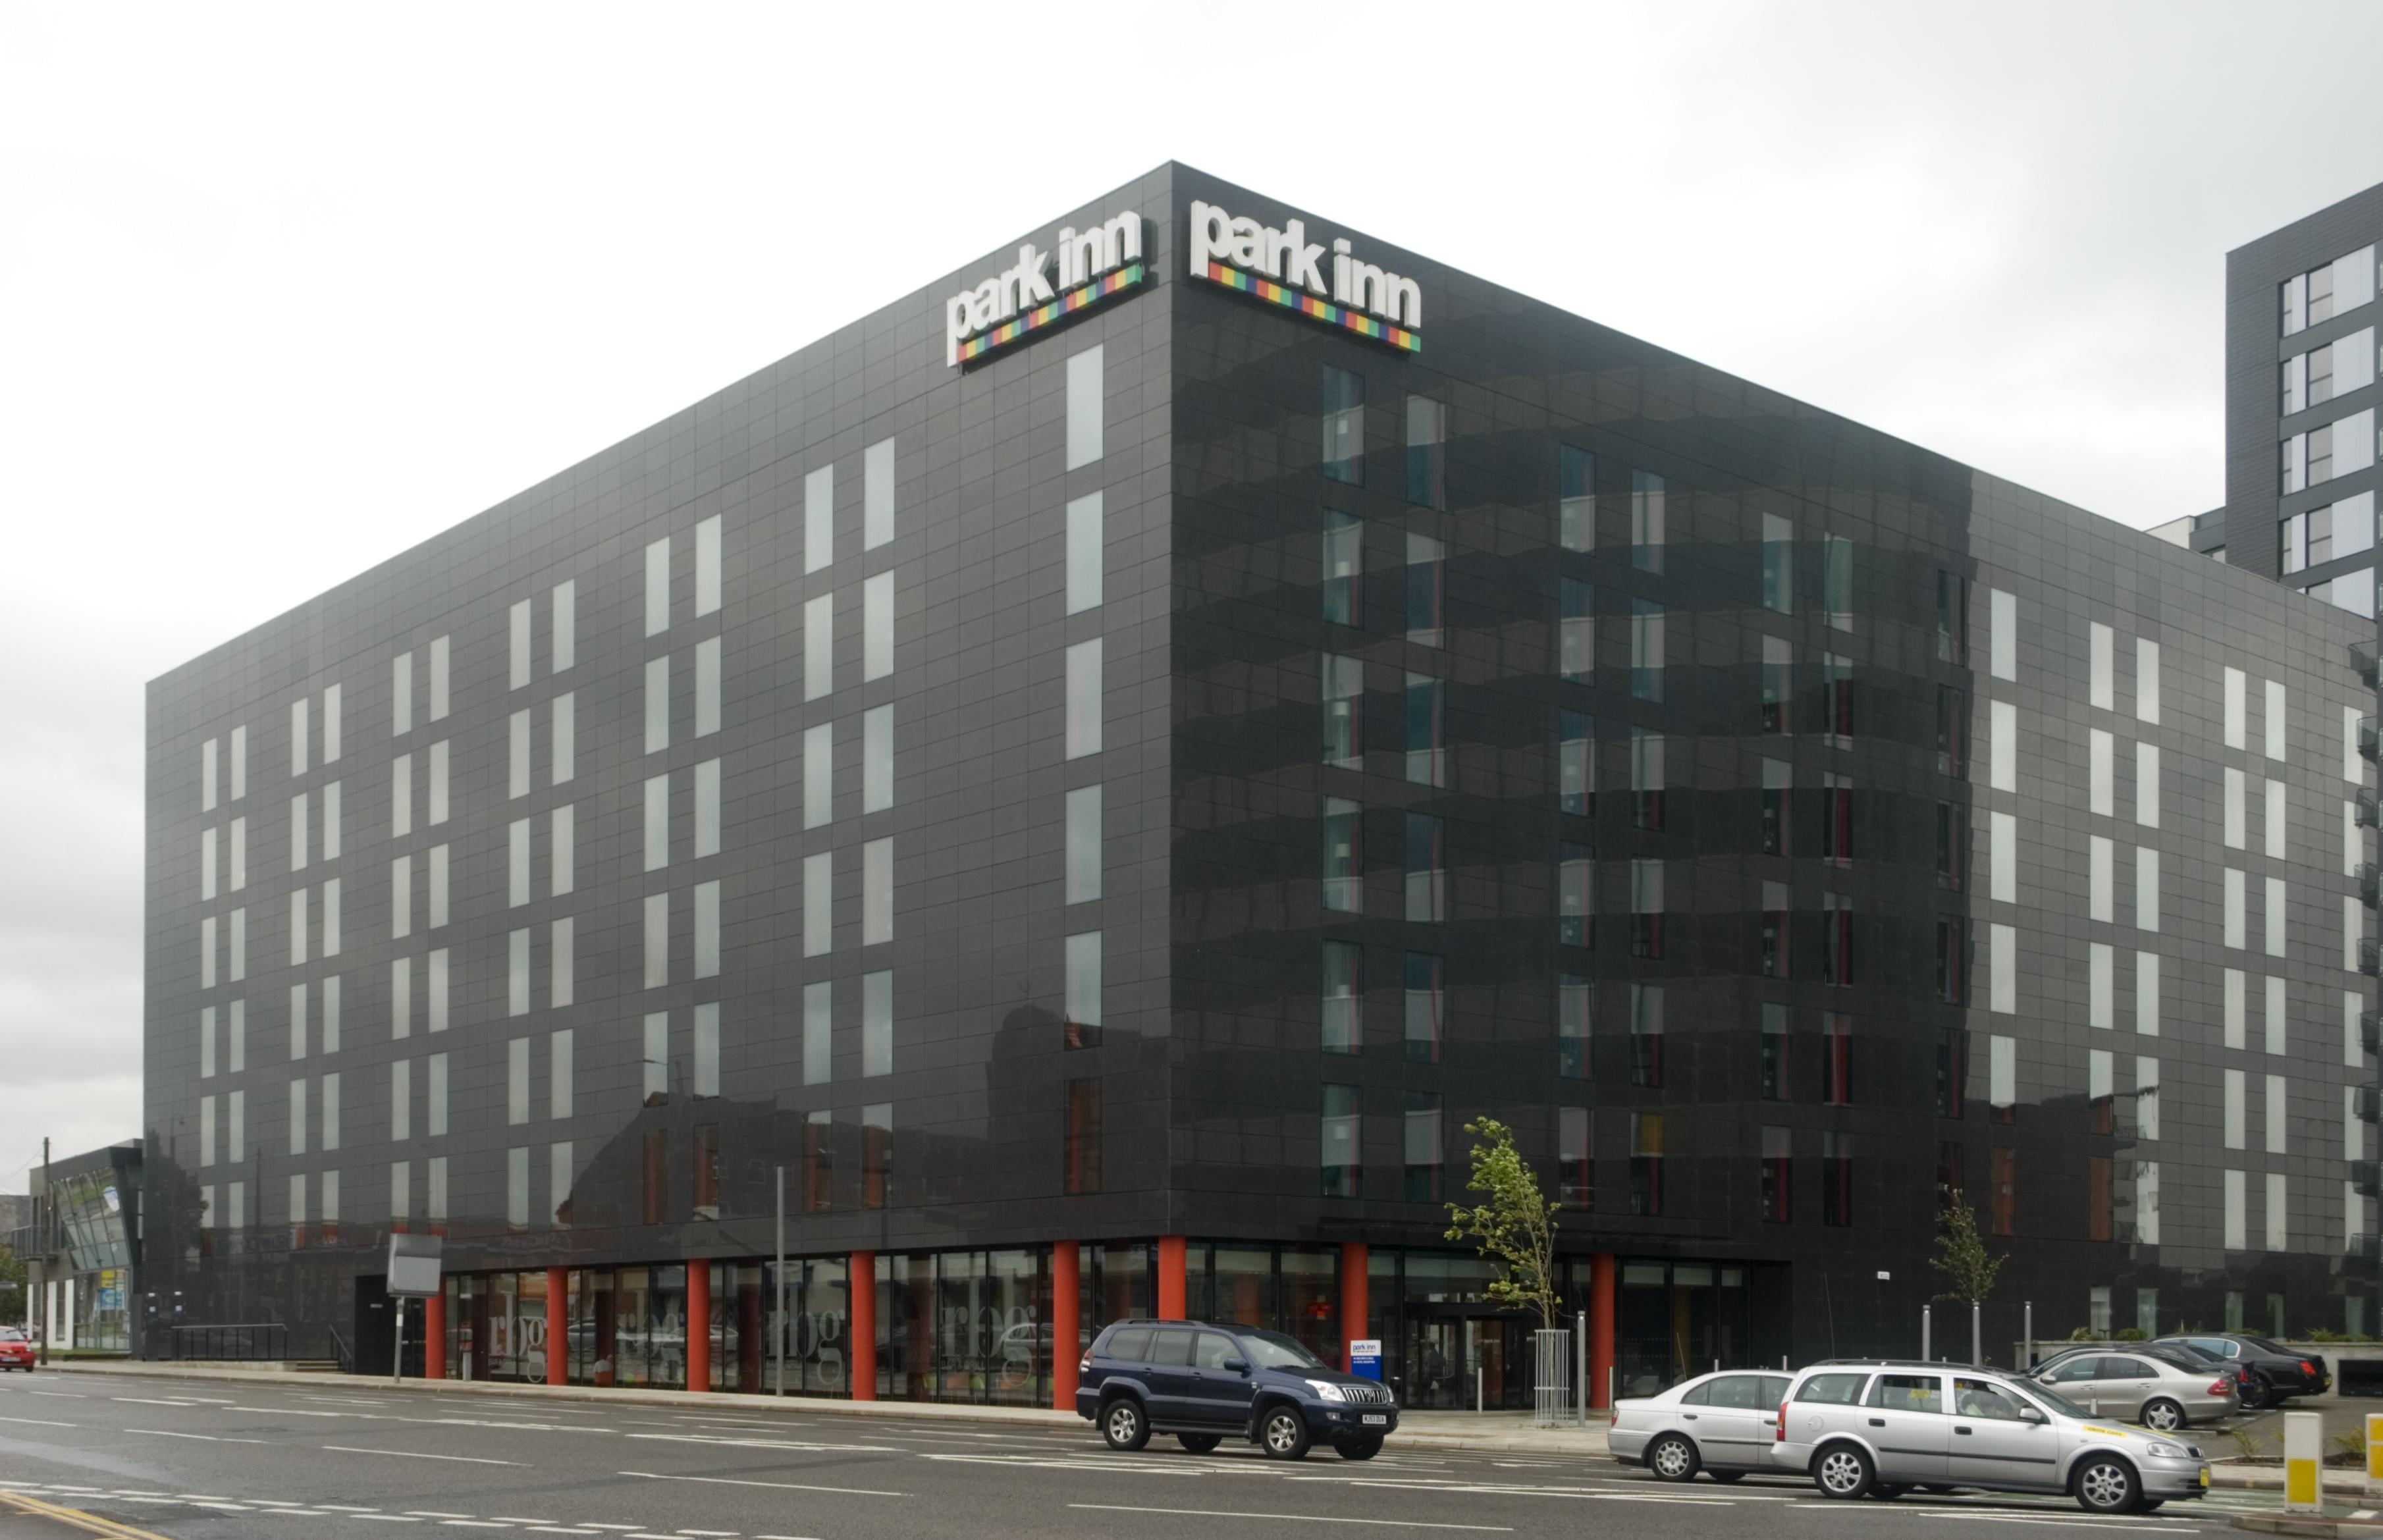 park inn hotel manchester keyclad experts in external. Black Bedroom Furniture Sets. Home Design Ideas